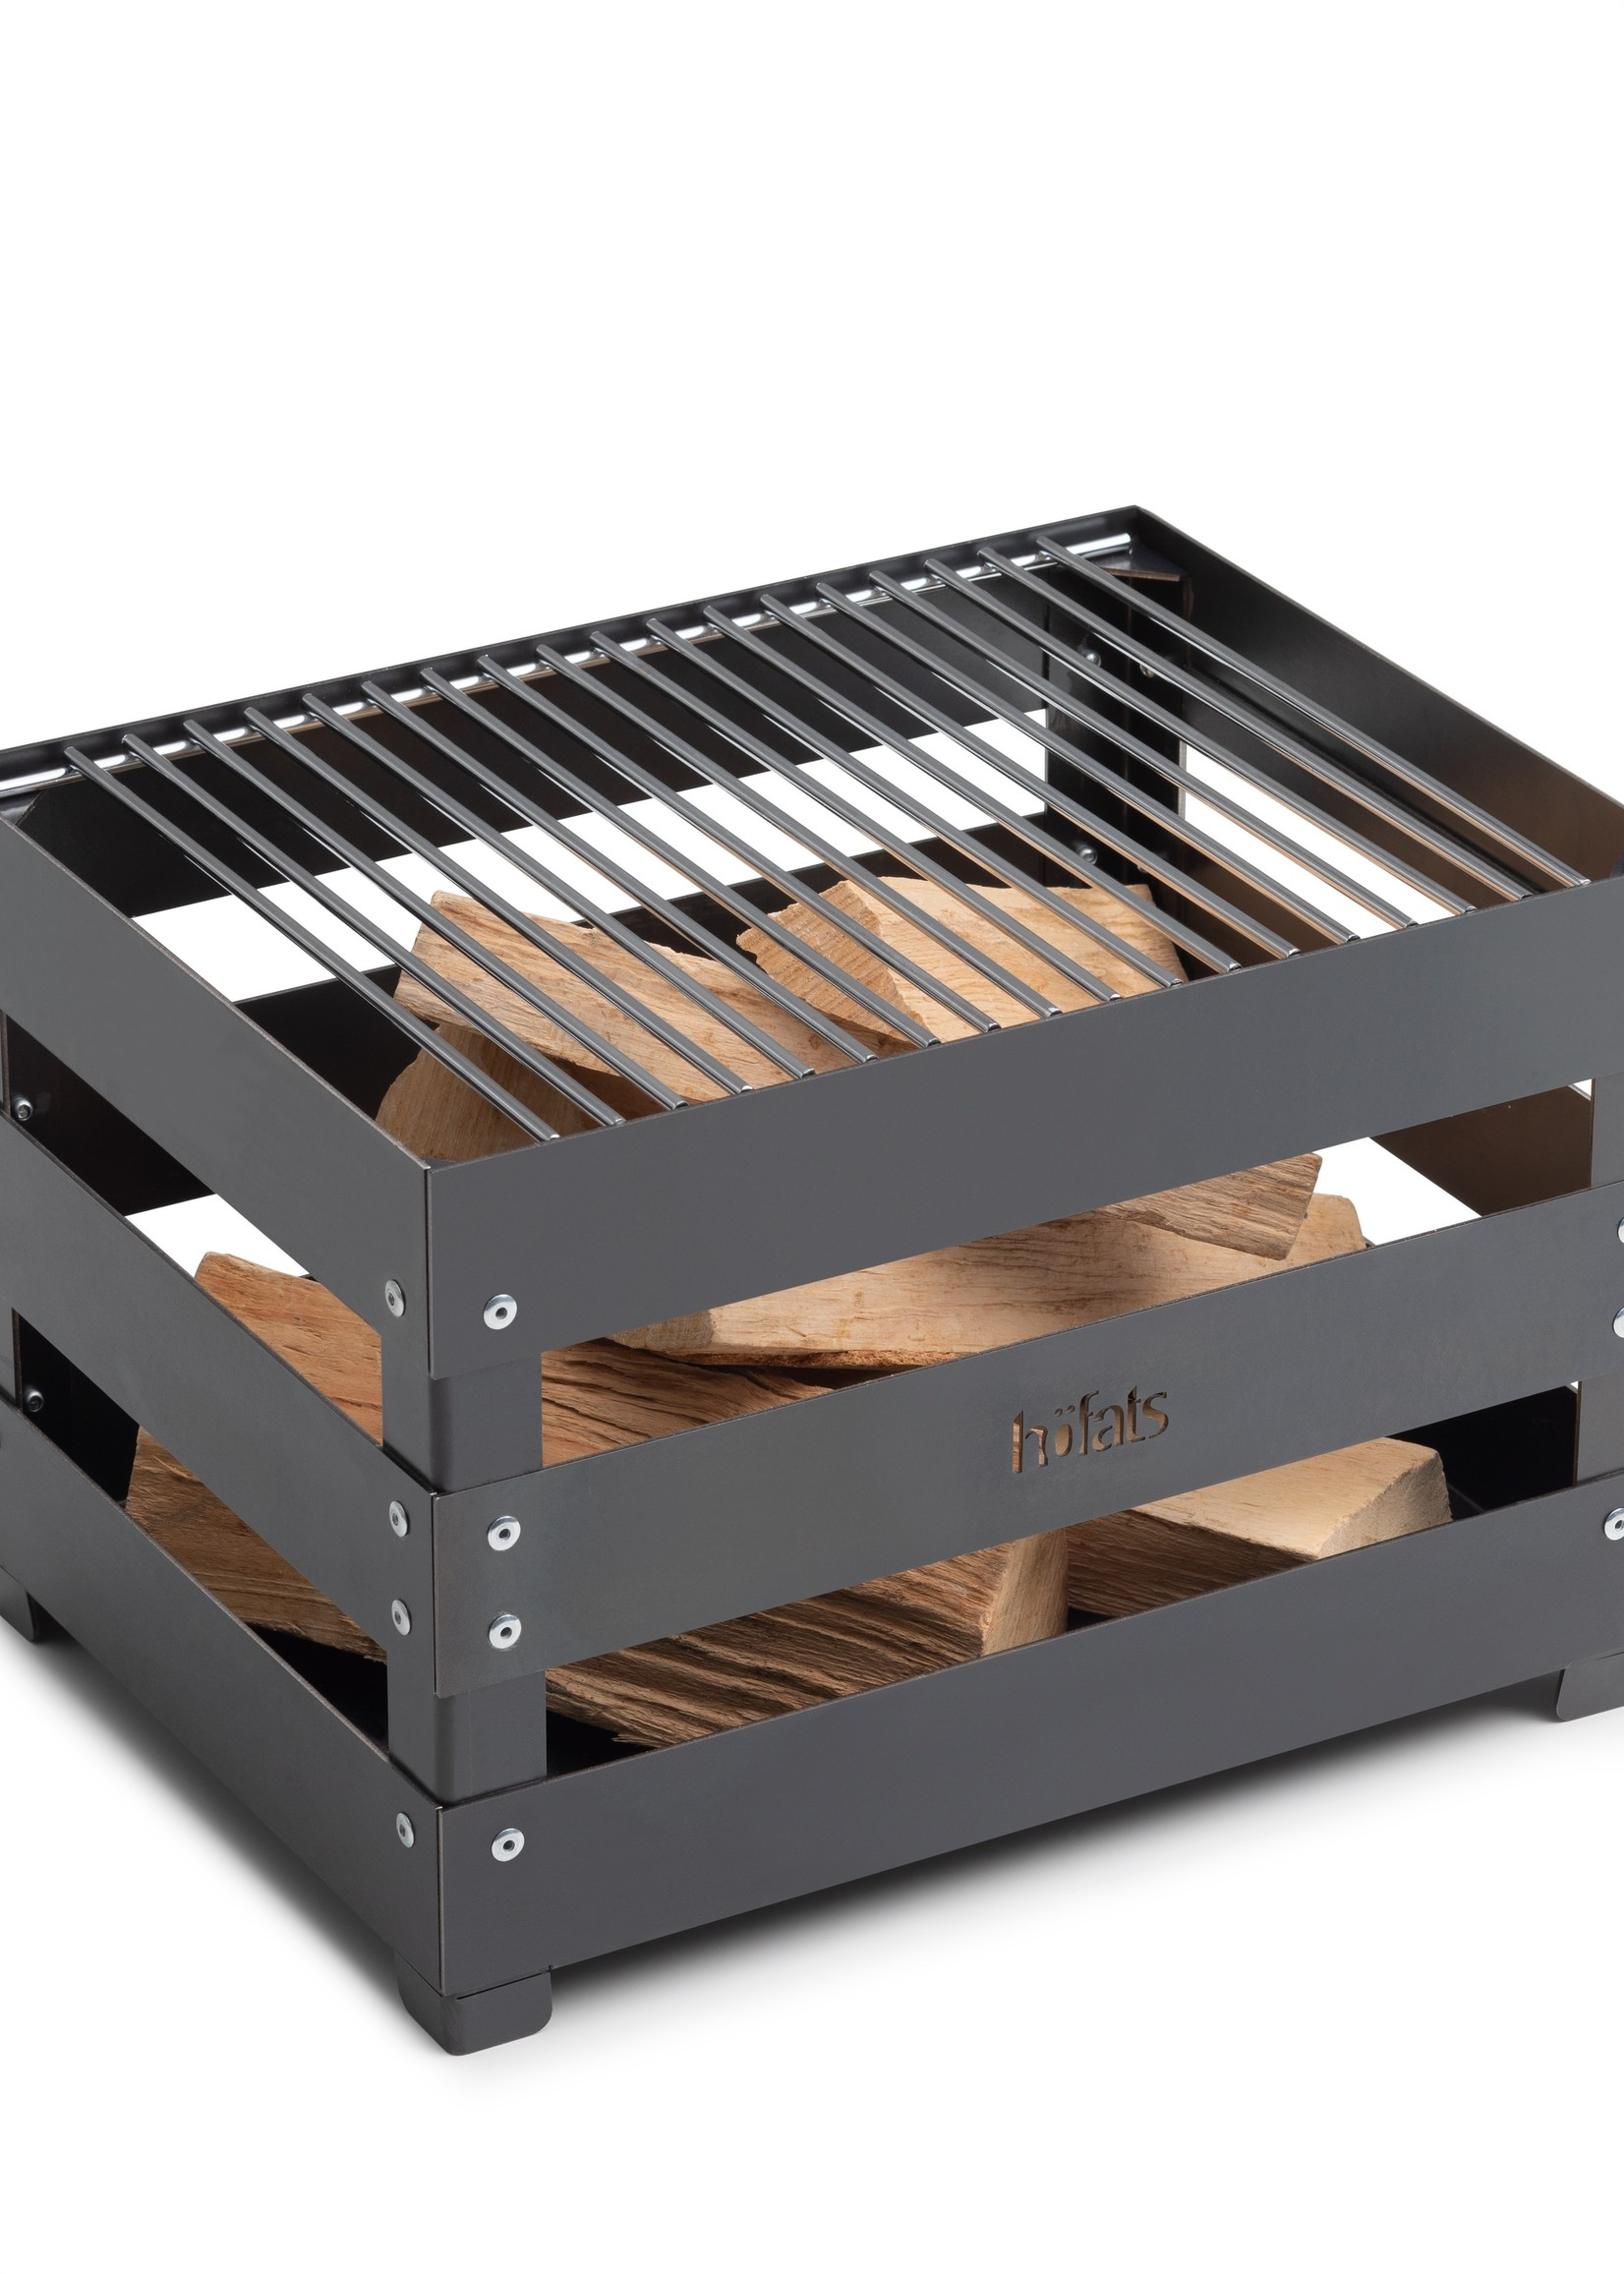 Höfats Crate Vuurkorf Grillrooster